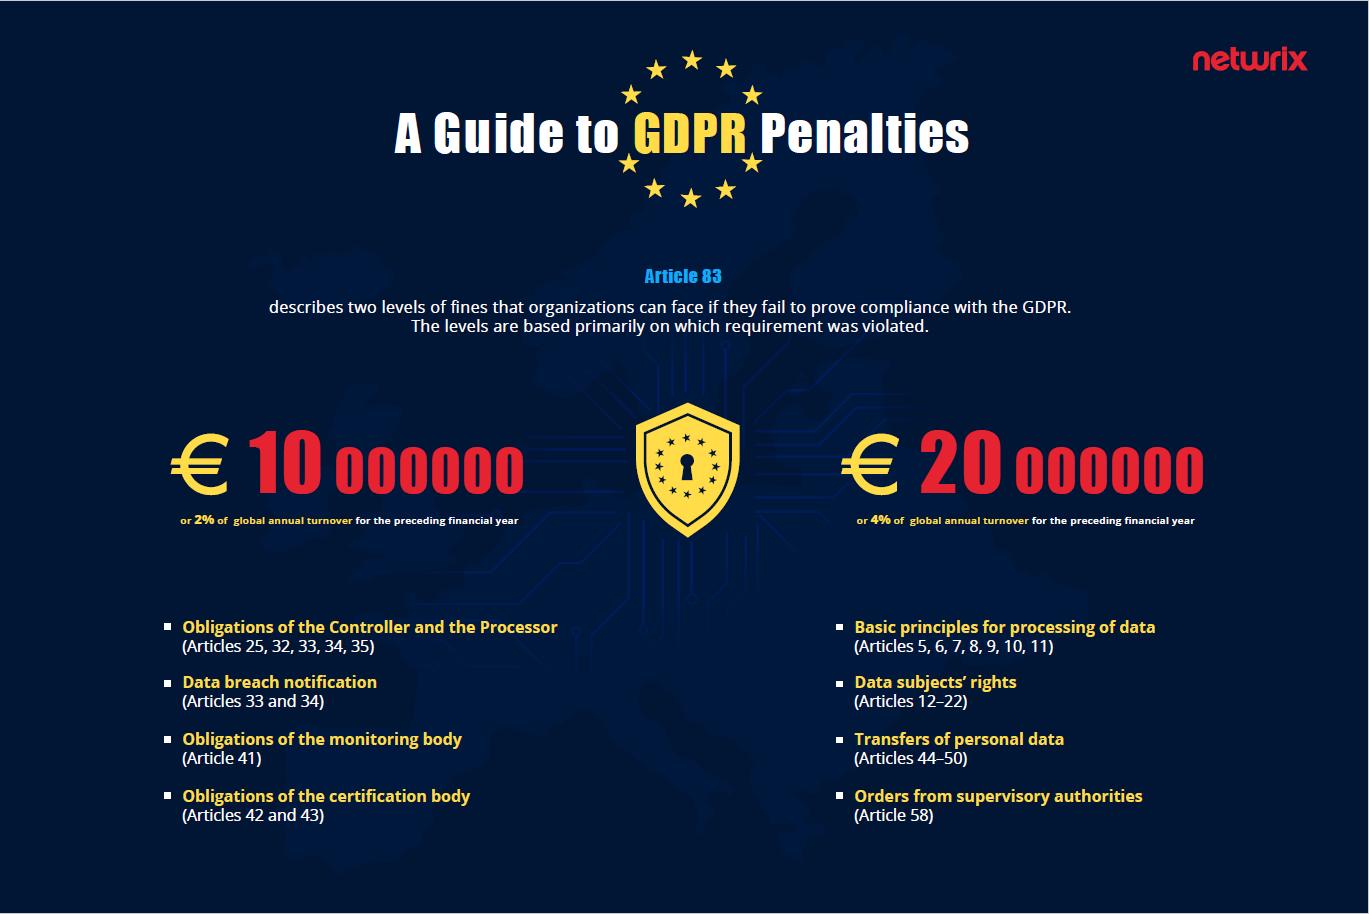 General Data Protection Regulation GDPR Fines